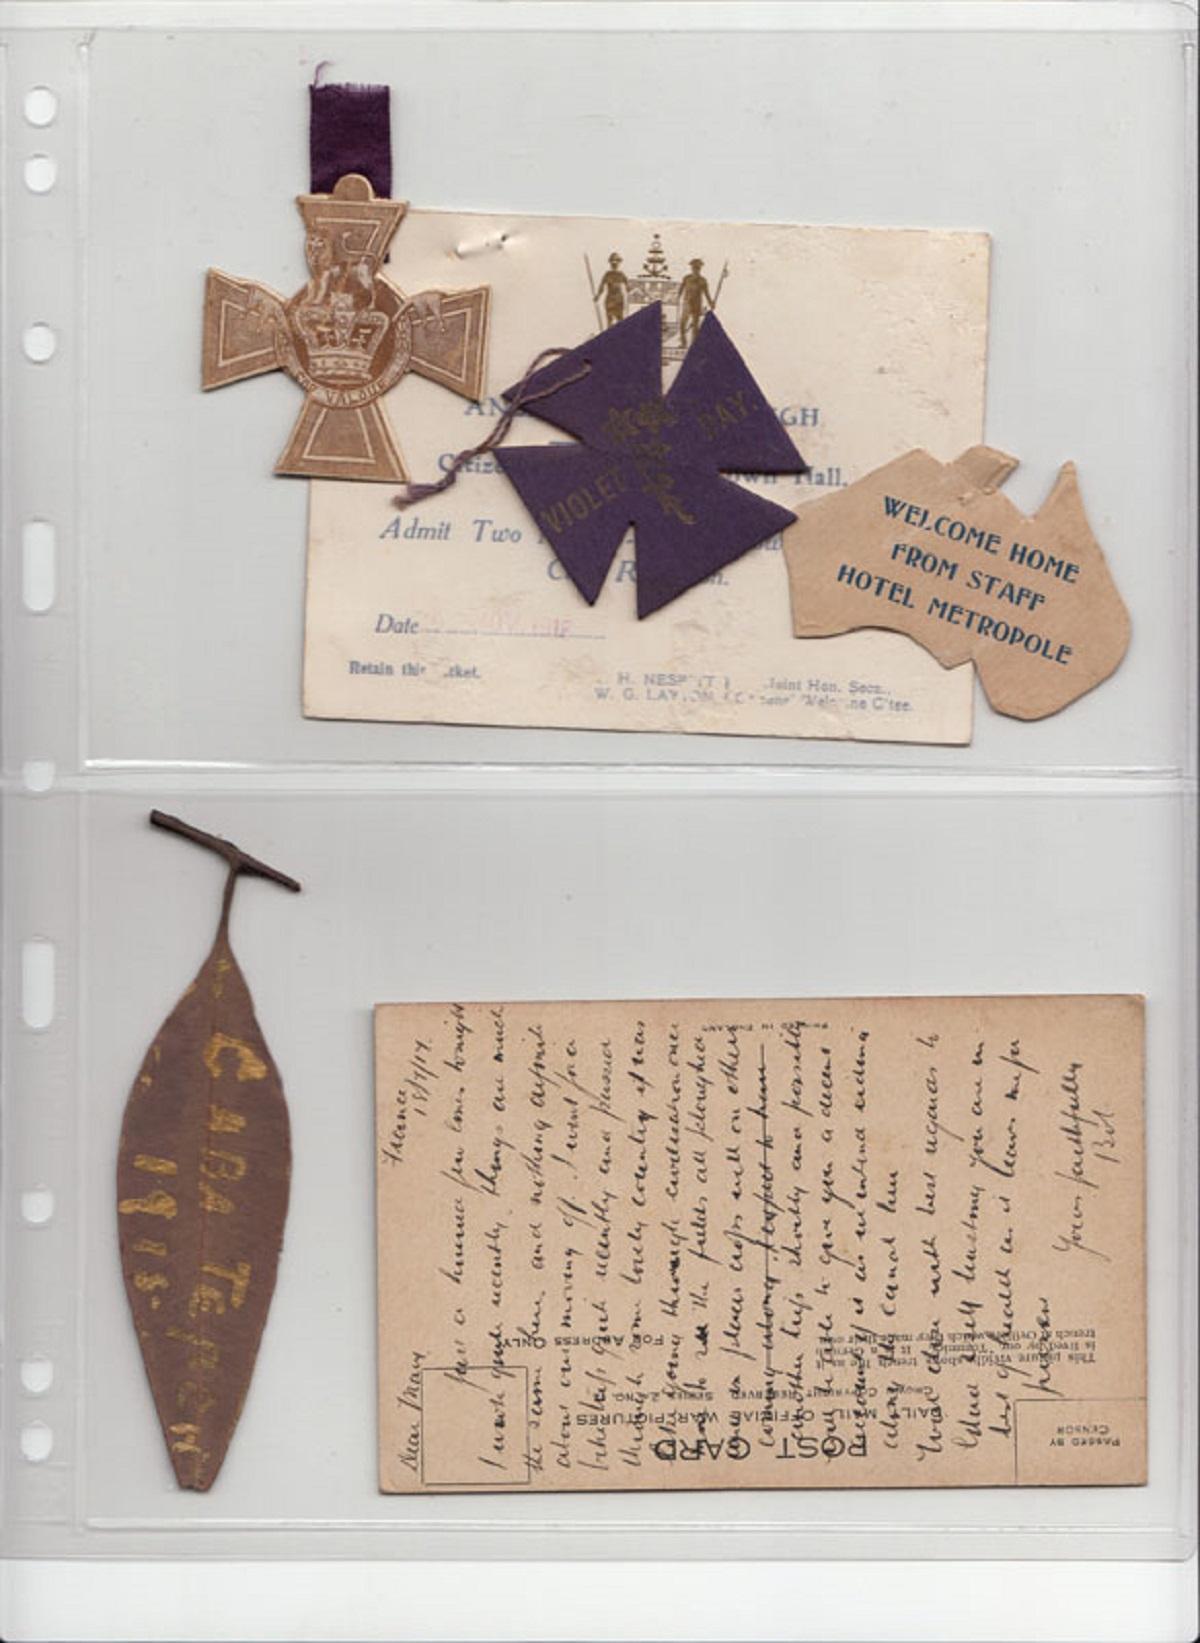 WWI Australia. Ephemera including the signature of William Jackson V.C. on a souvenir cardboard replica of a Victoria Cross